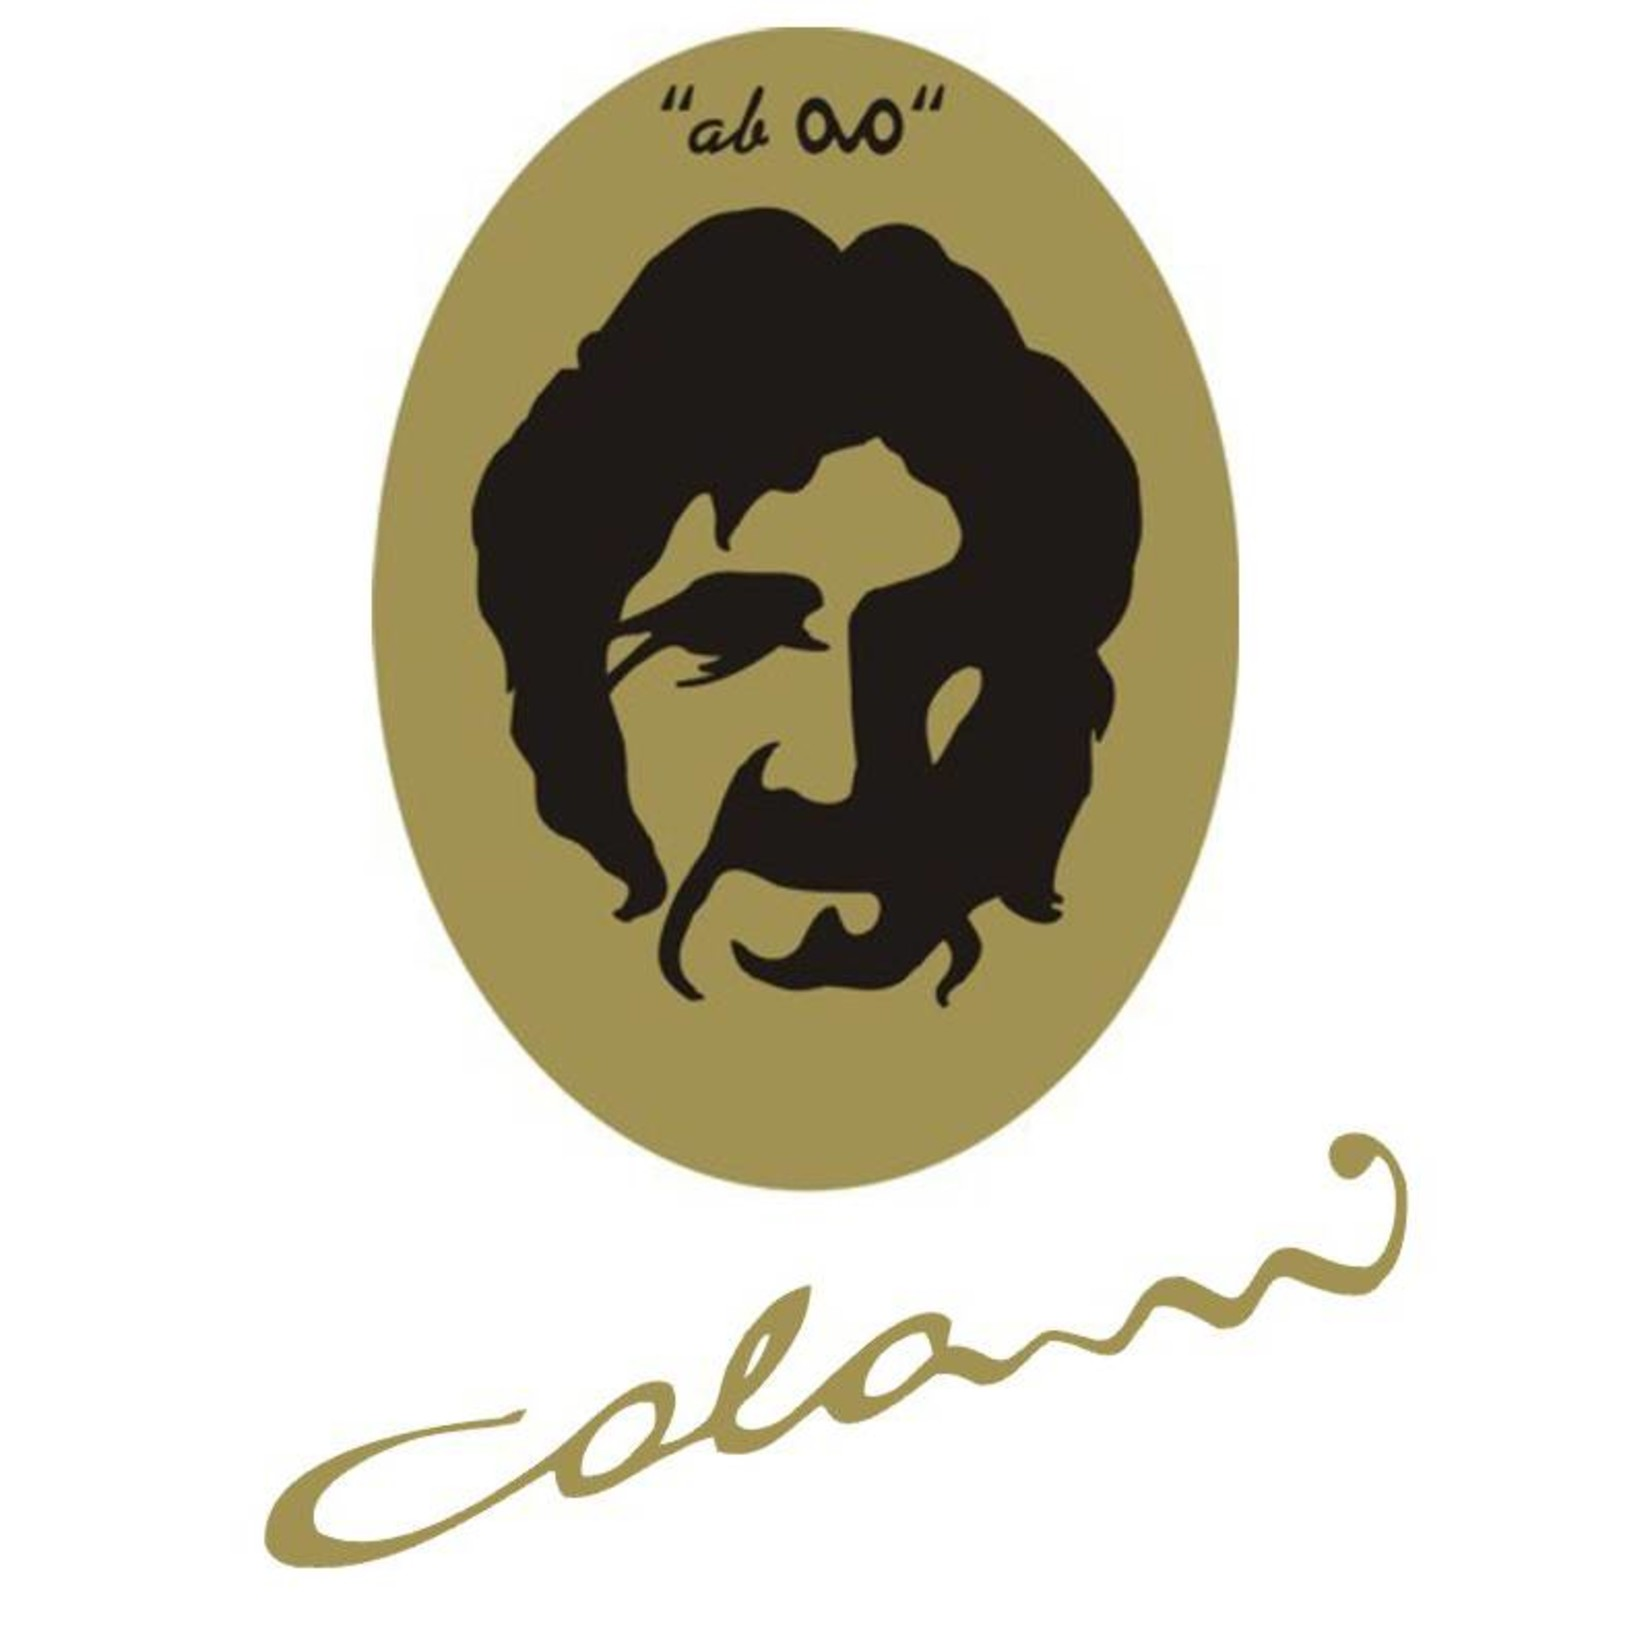 Colani Porzellanserie Colani Espressotasse, groß | Tasse inkl. Unterteller | grün